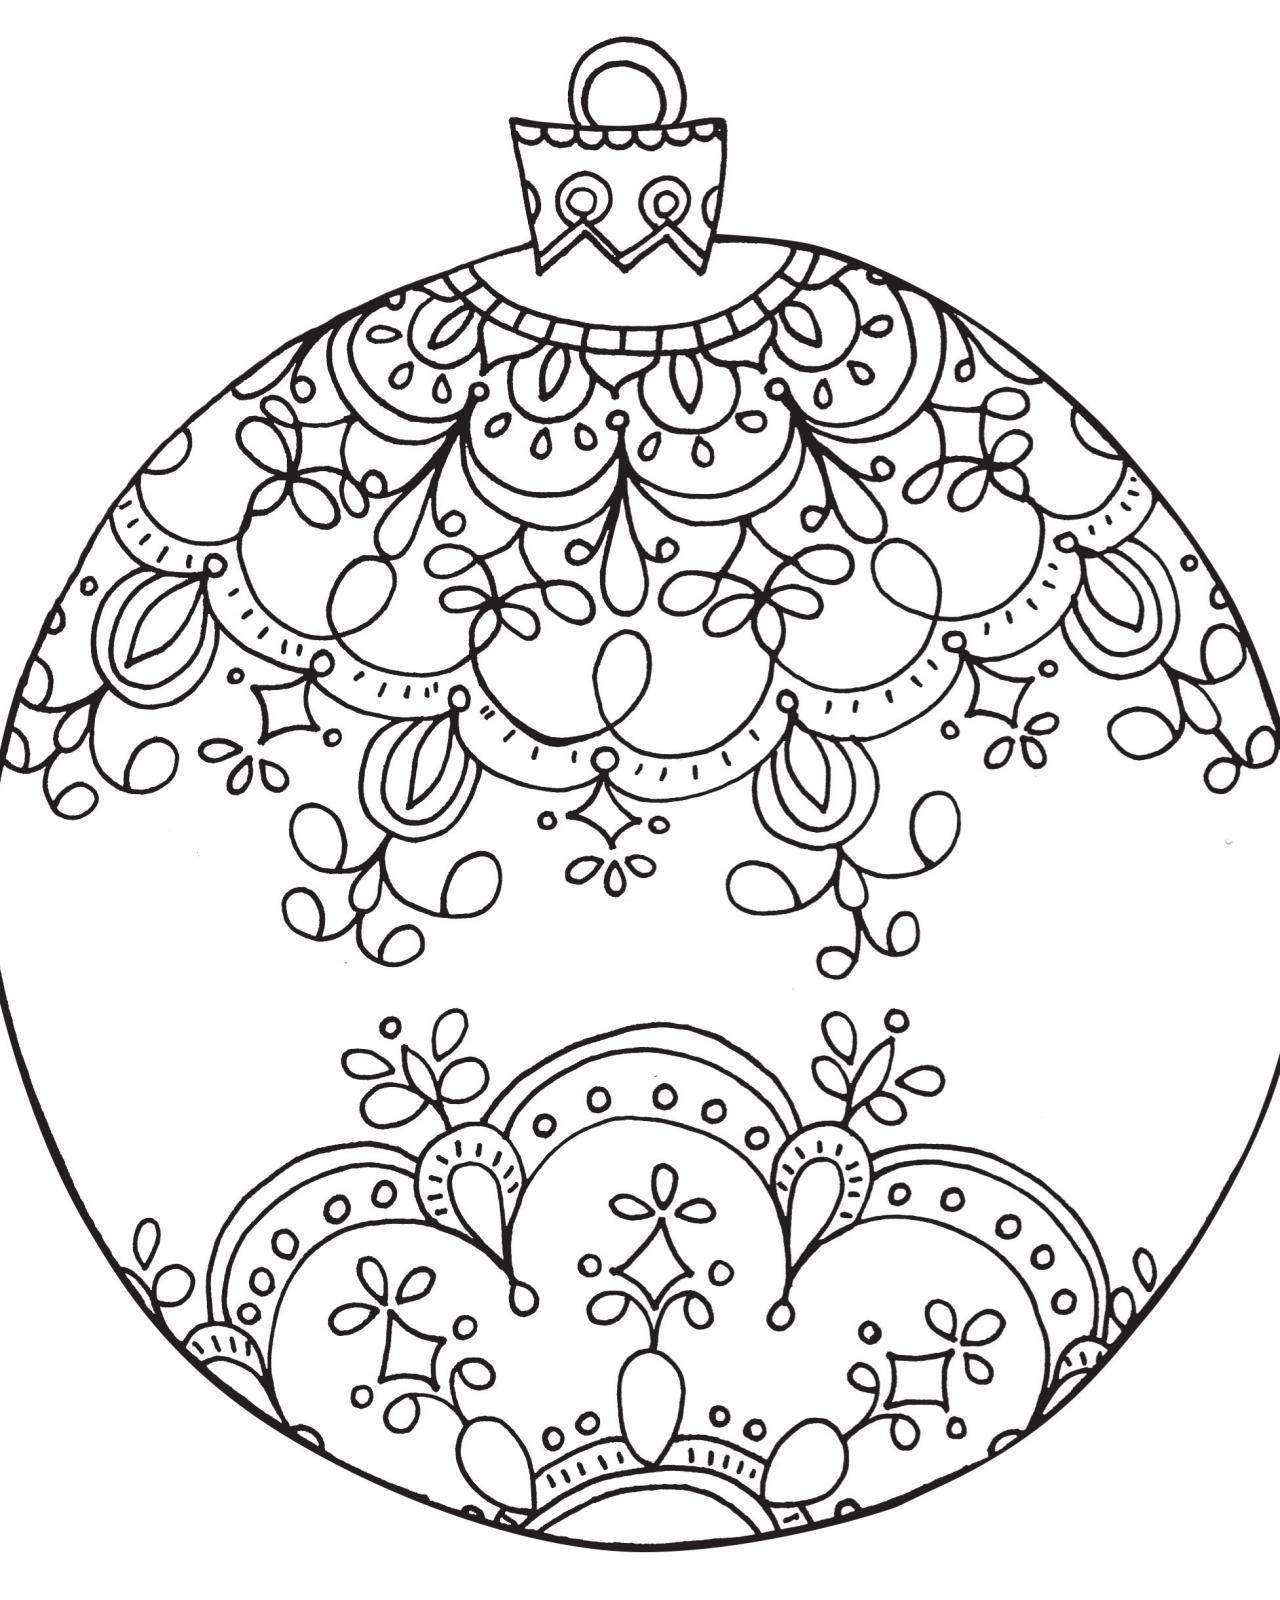 Christmas Mandala Coloring Pages Printable Download 1 G Printable Christmas Coloring Pages Christmas Coloring Books Free Christmas Coloring Pages